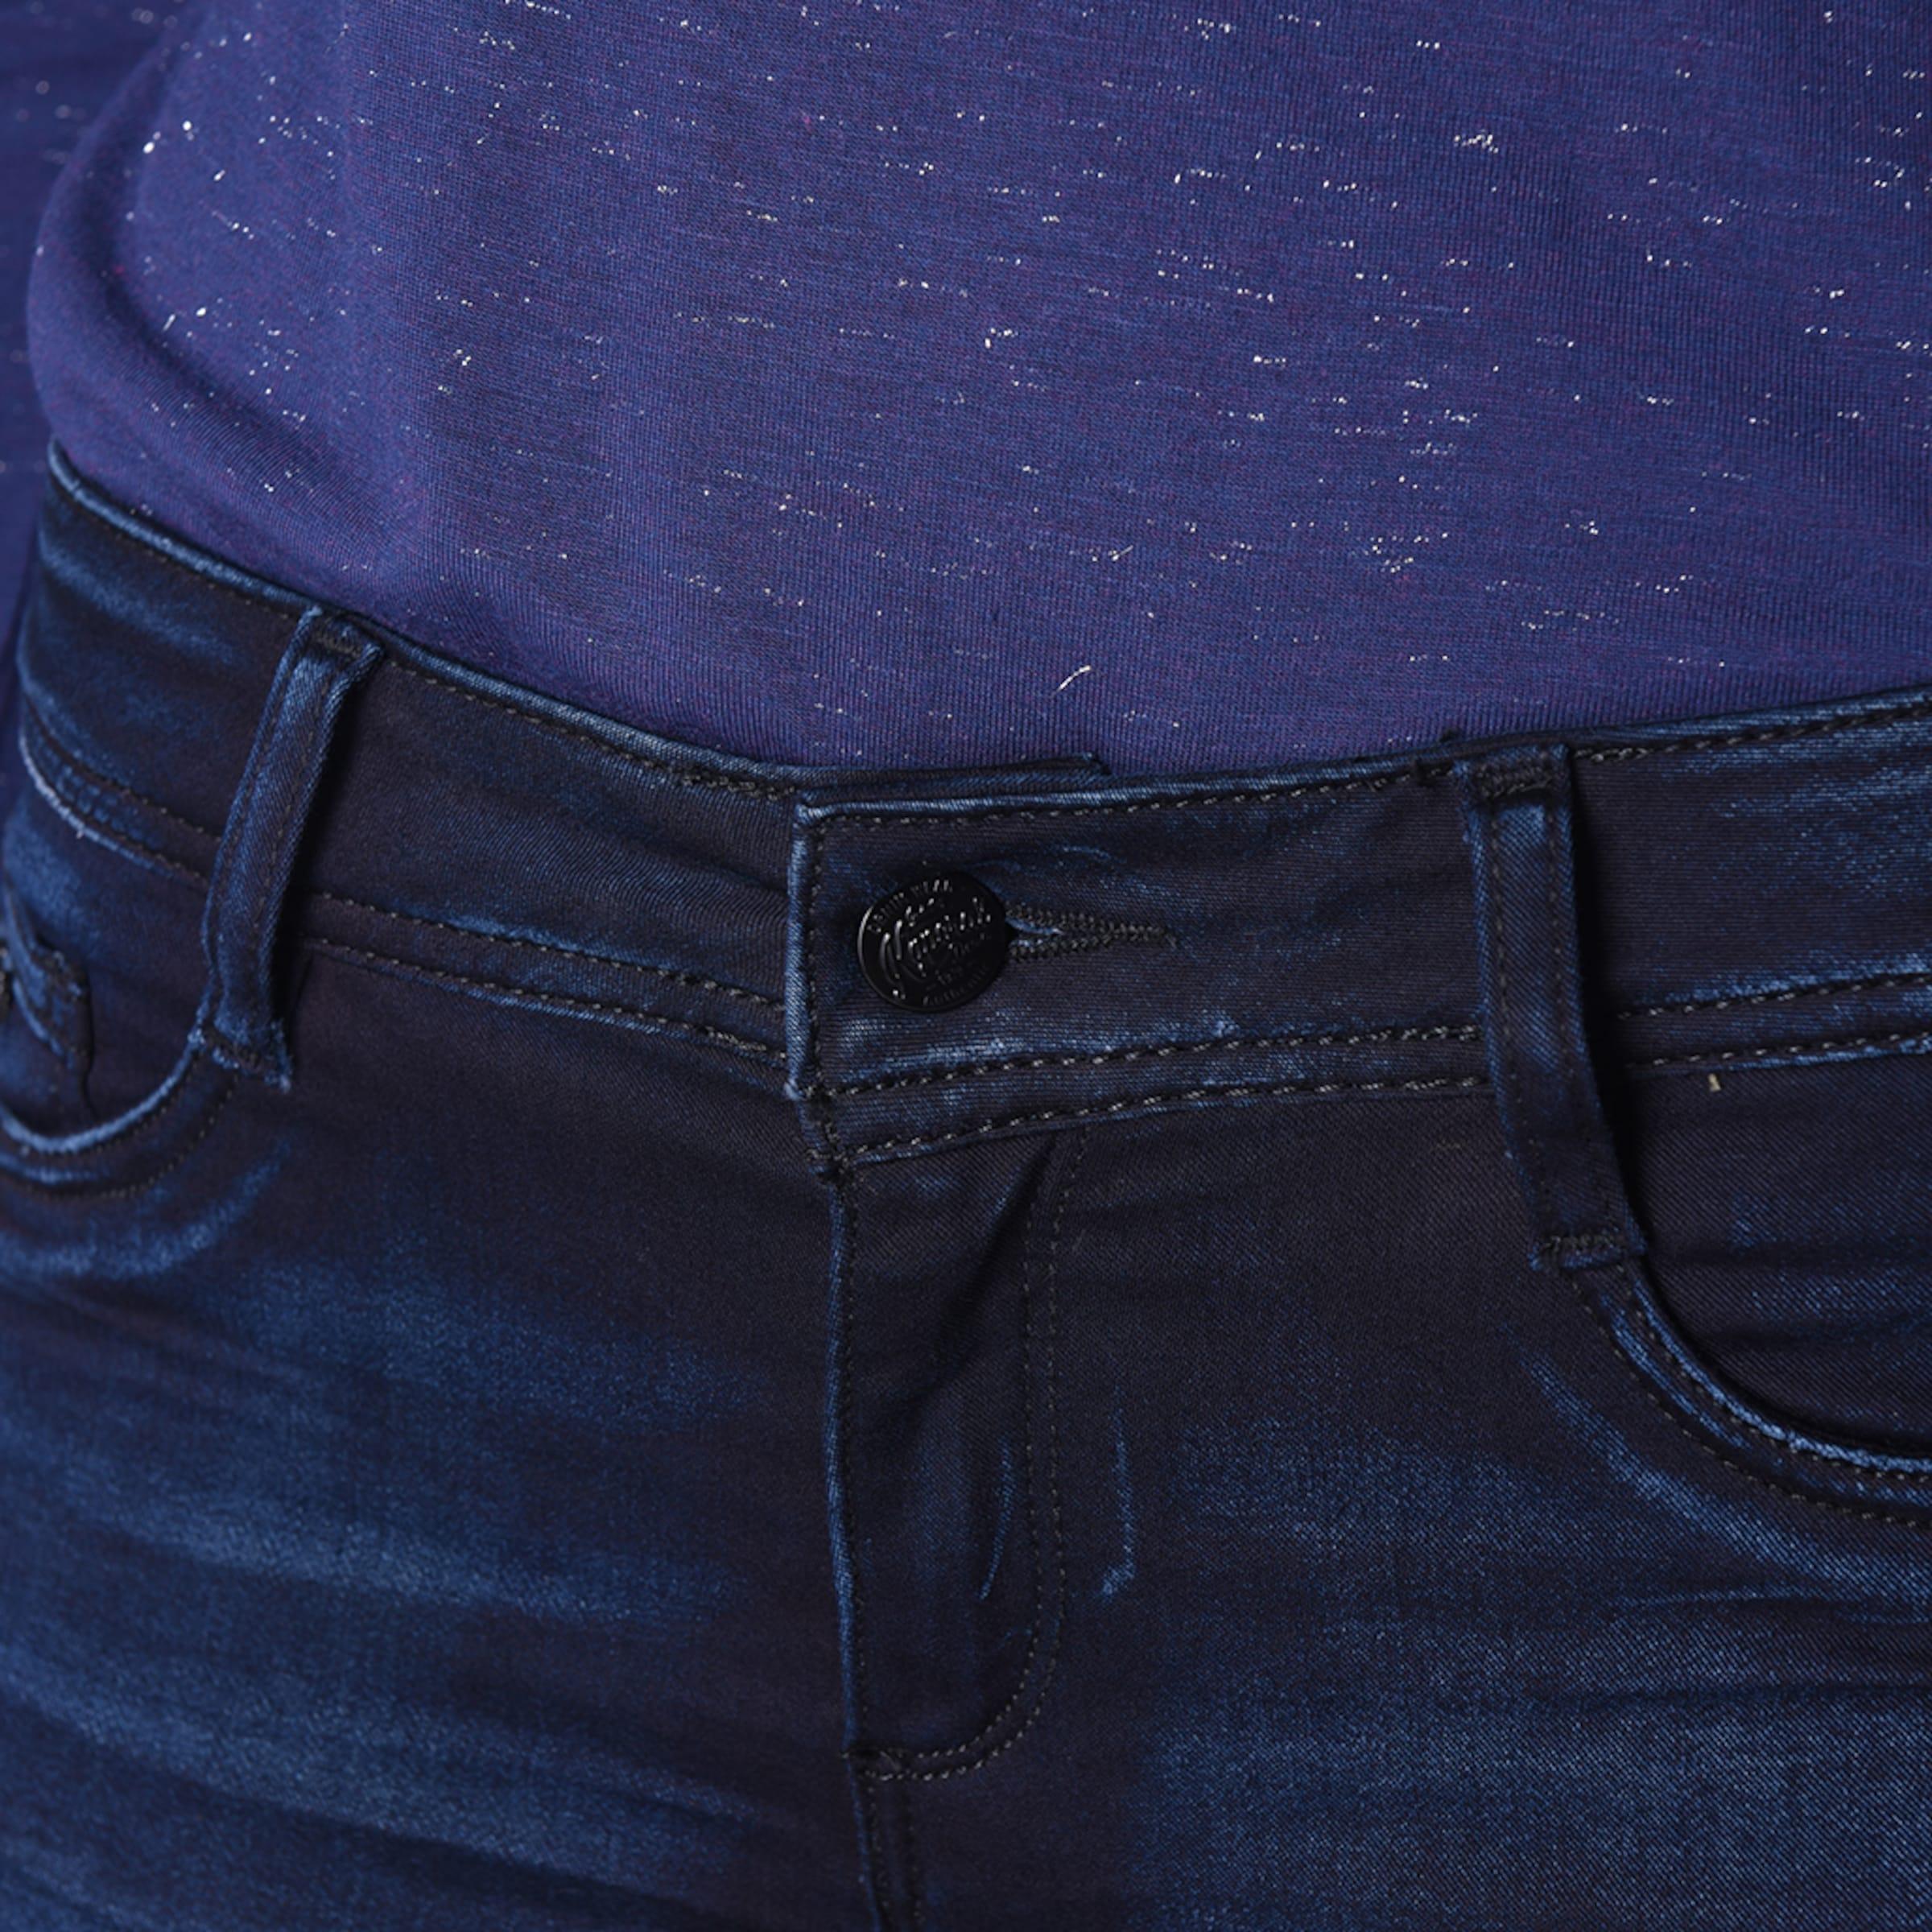 In Jeans Jeans Nachtblau Kaporal Nachtblau Kaporal In n8XwOPk0